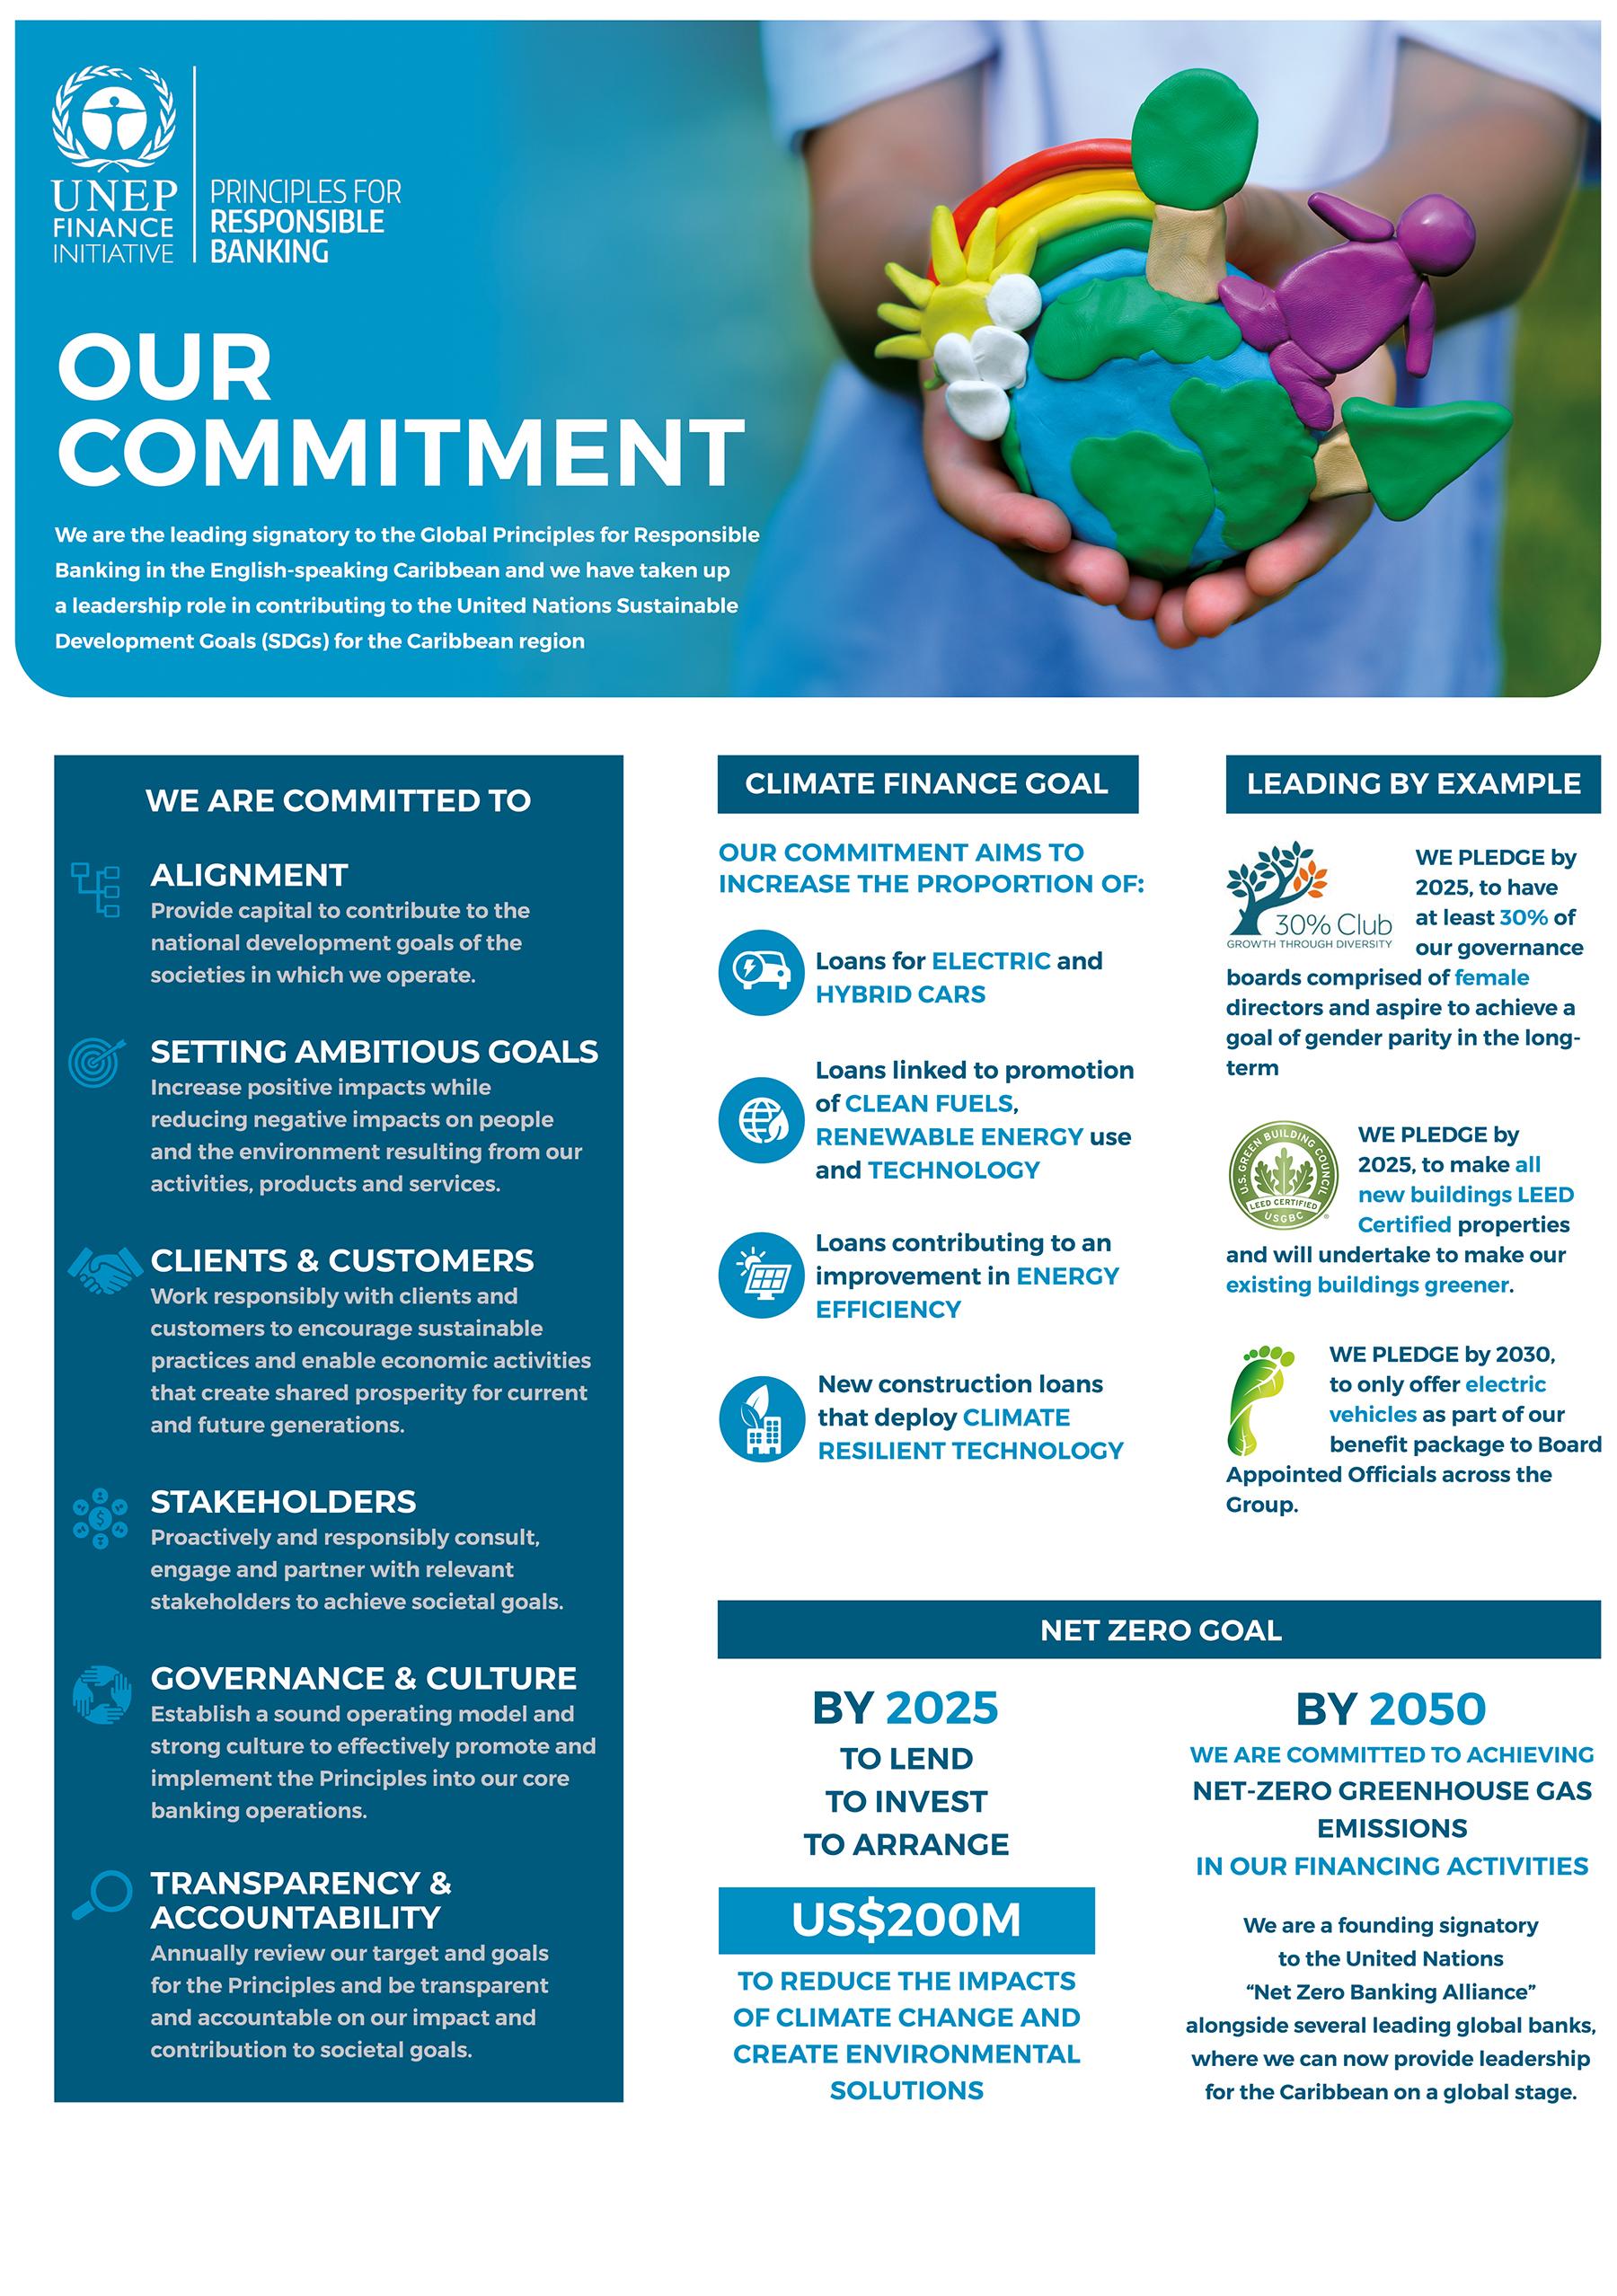 Principles of Responsible Banking